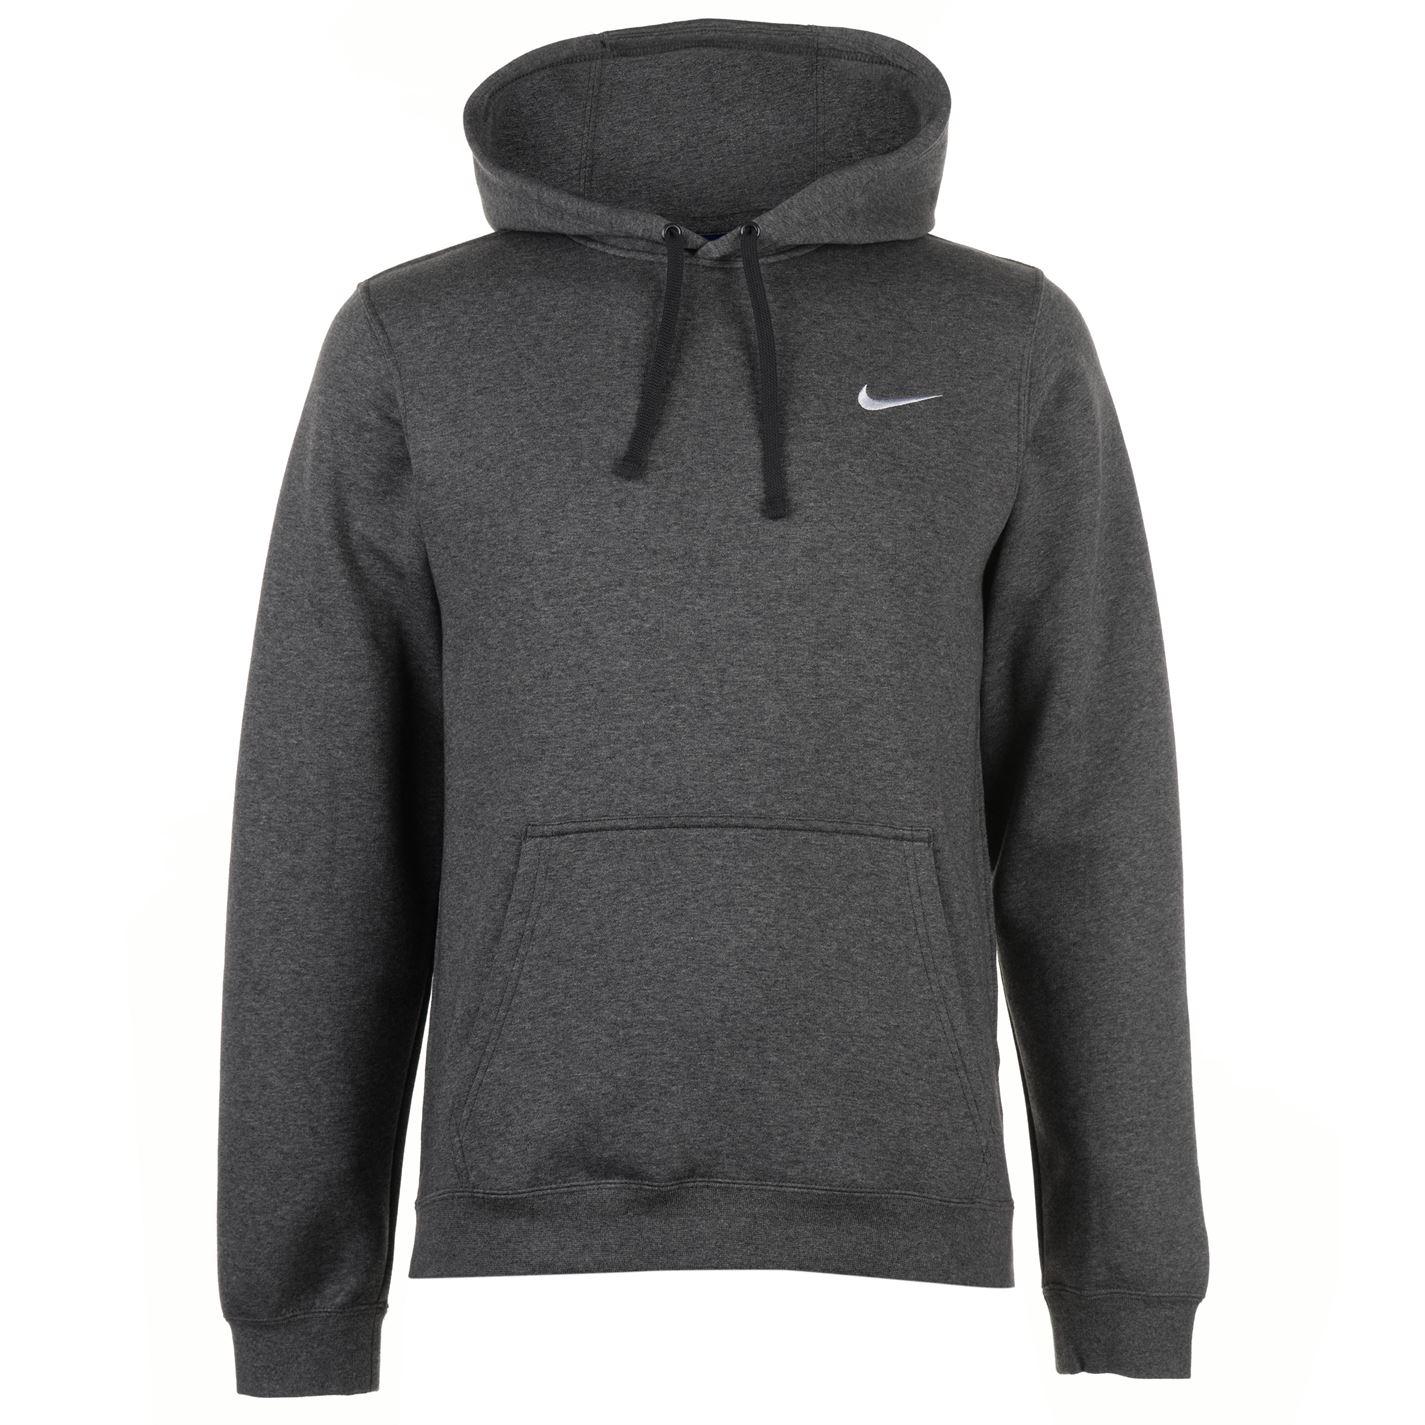 3c00f1c27 mikina Nike Fundamentals Fleece Hoody pánská